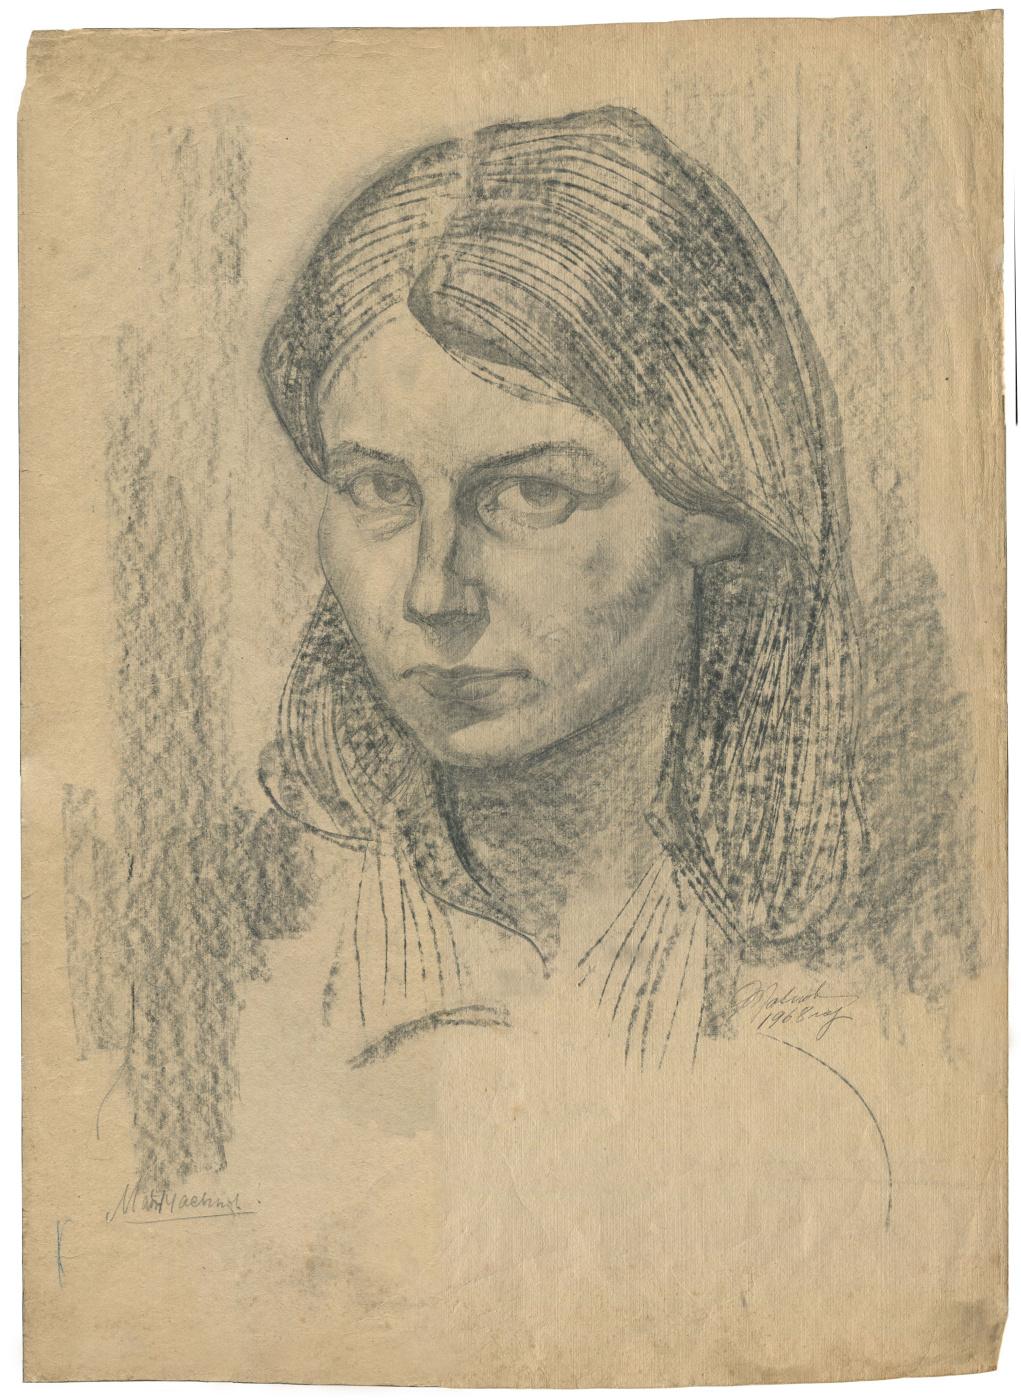 Alexandrovich Rudolf Pavlov. Portrait of a woman 3.